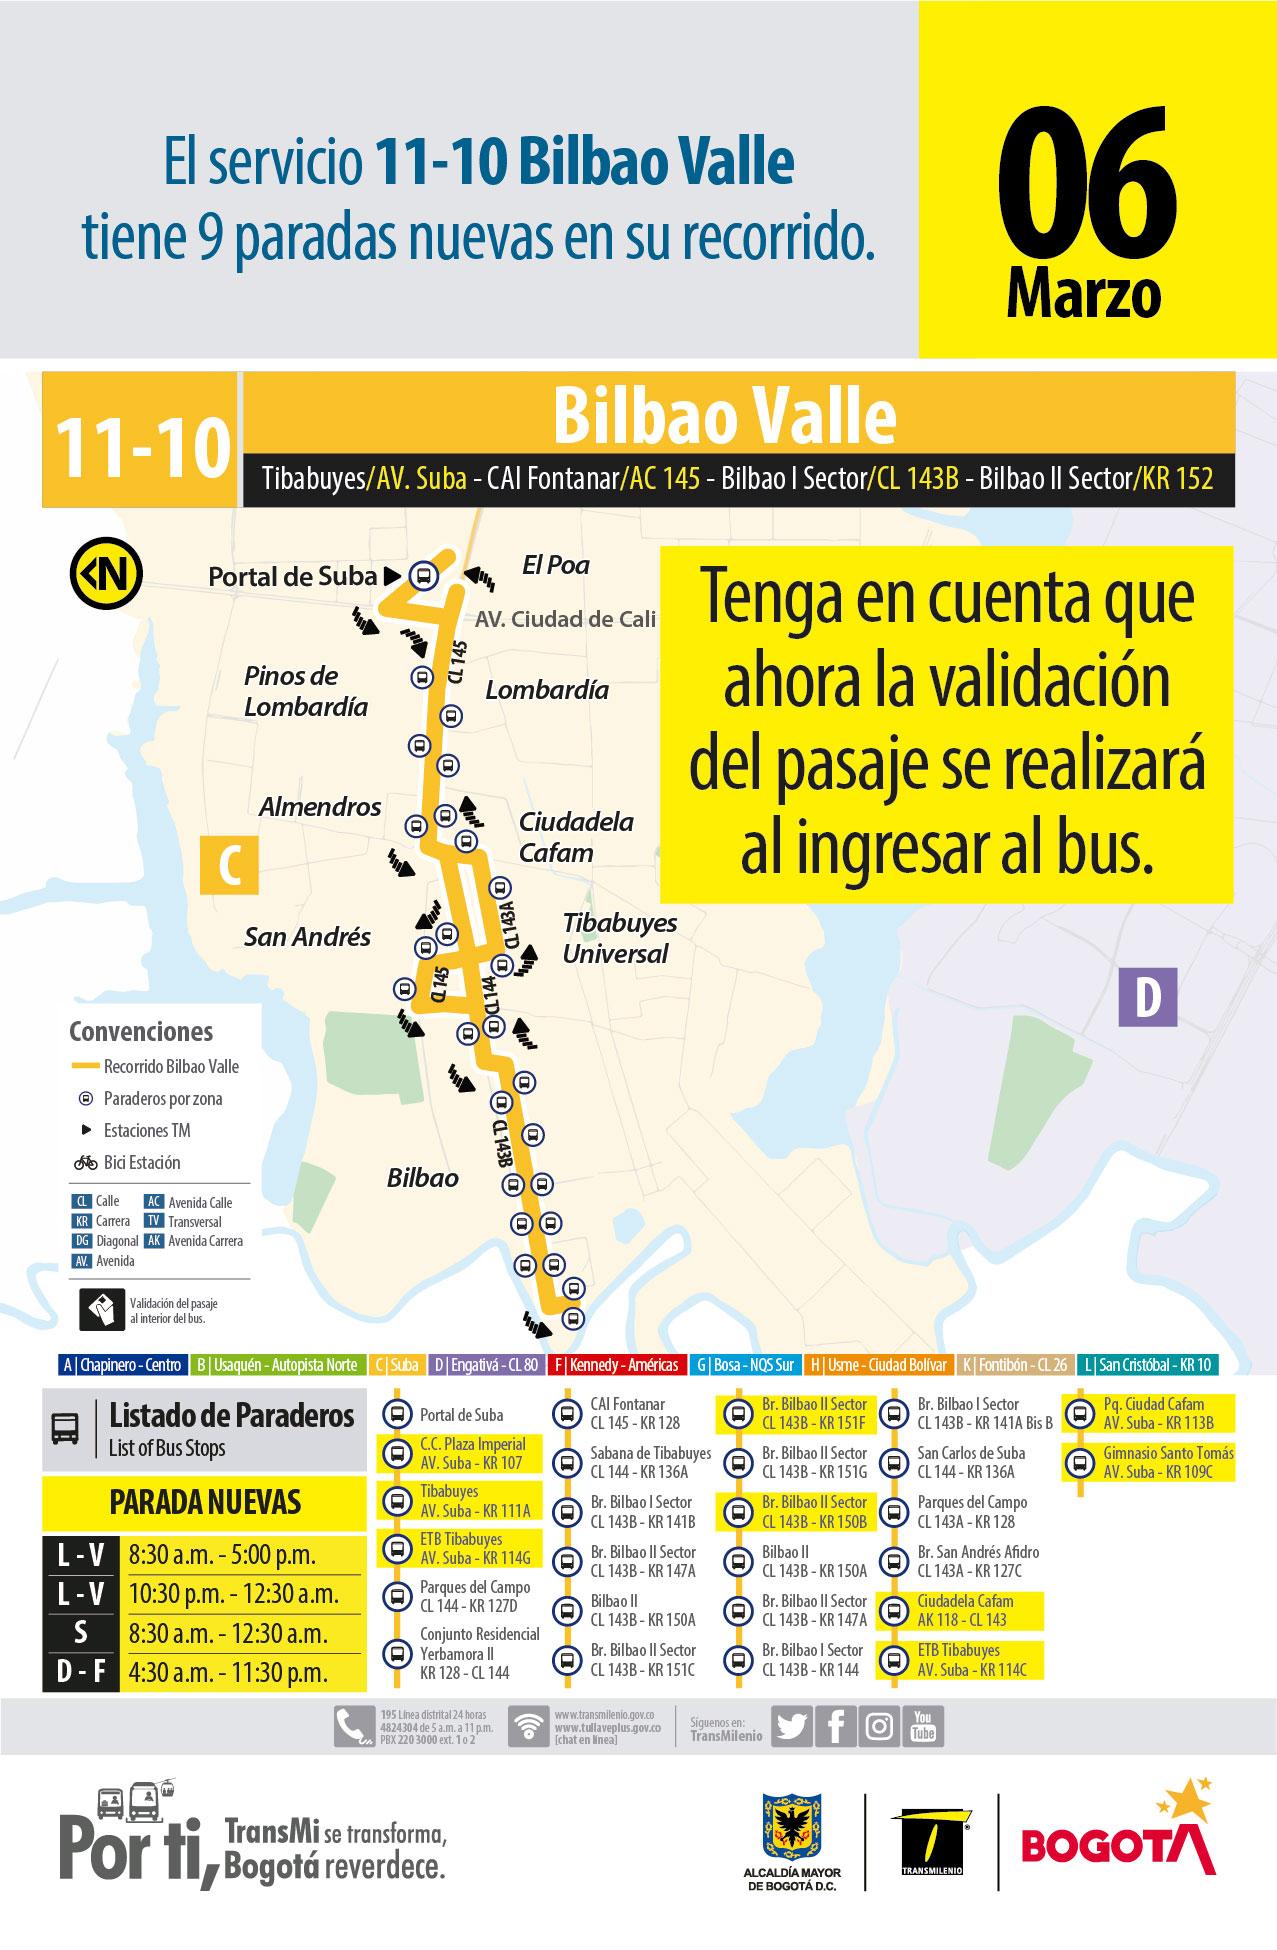 11-10 Bilbao Valle